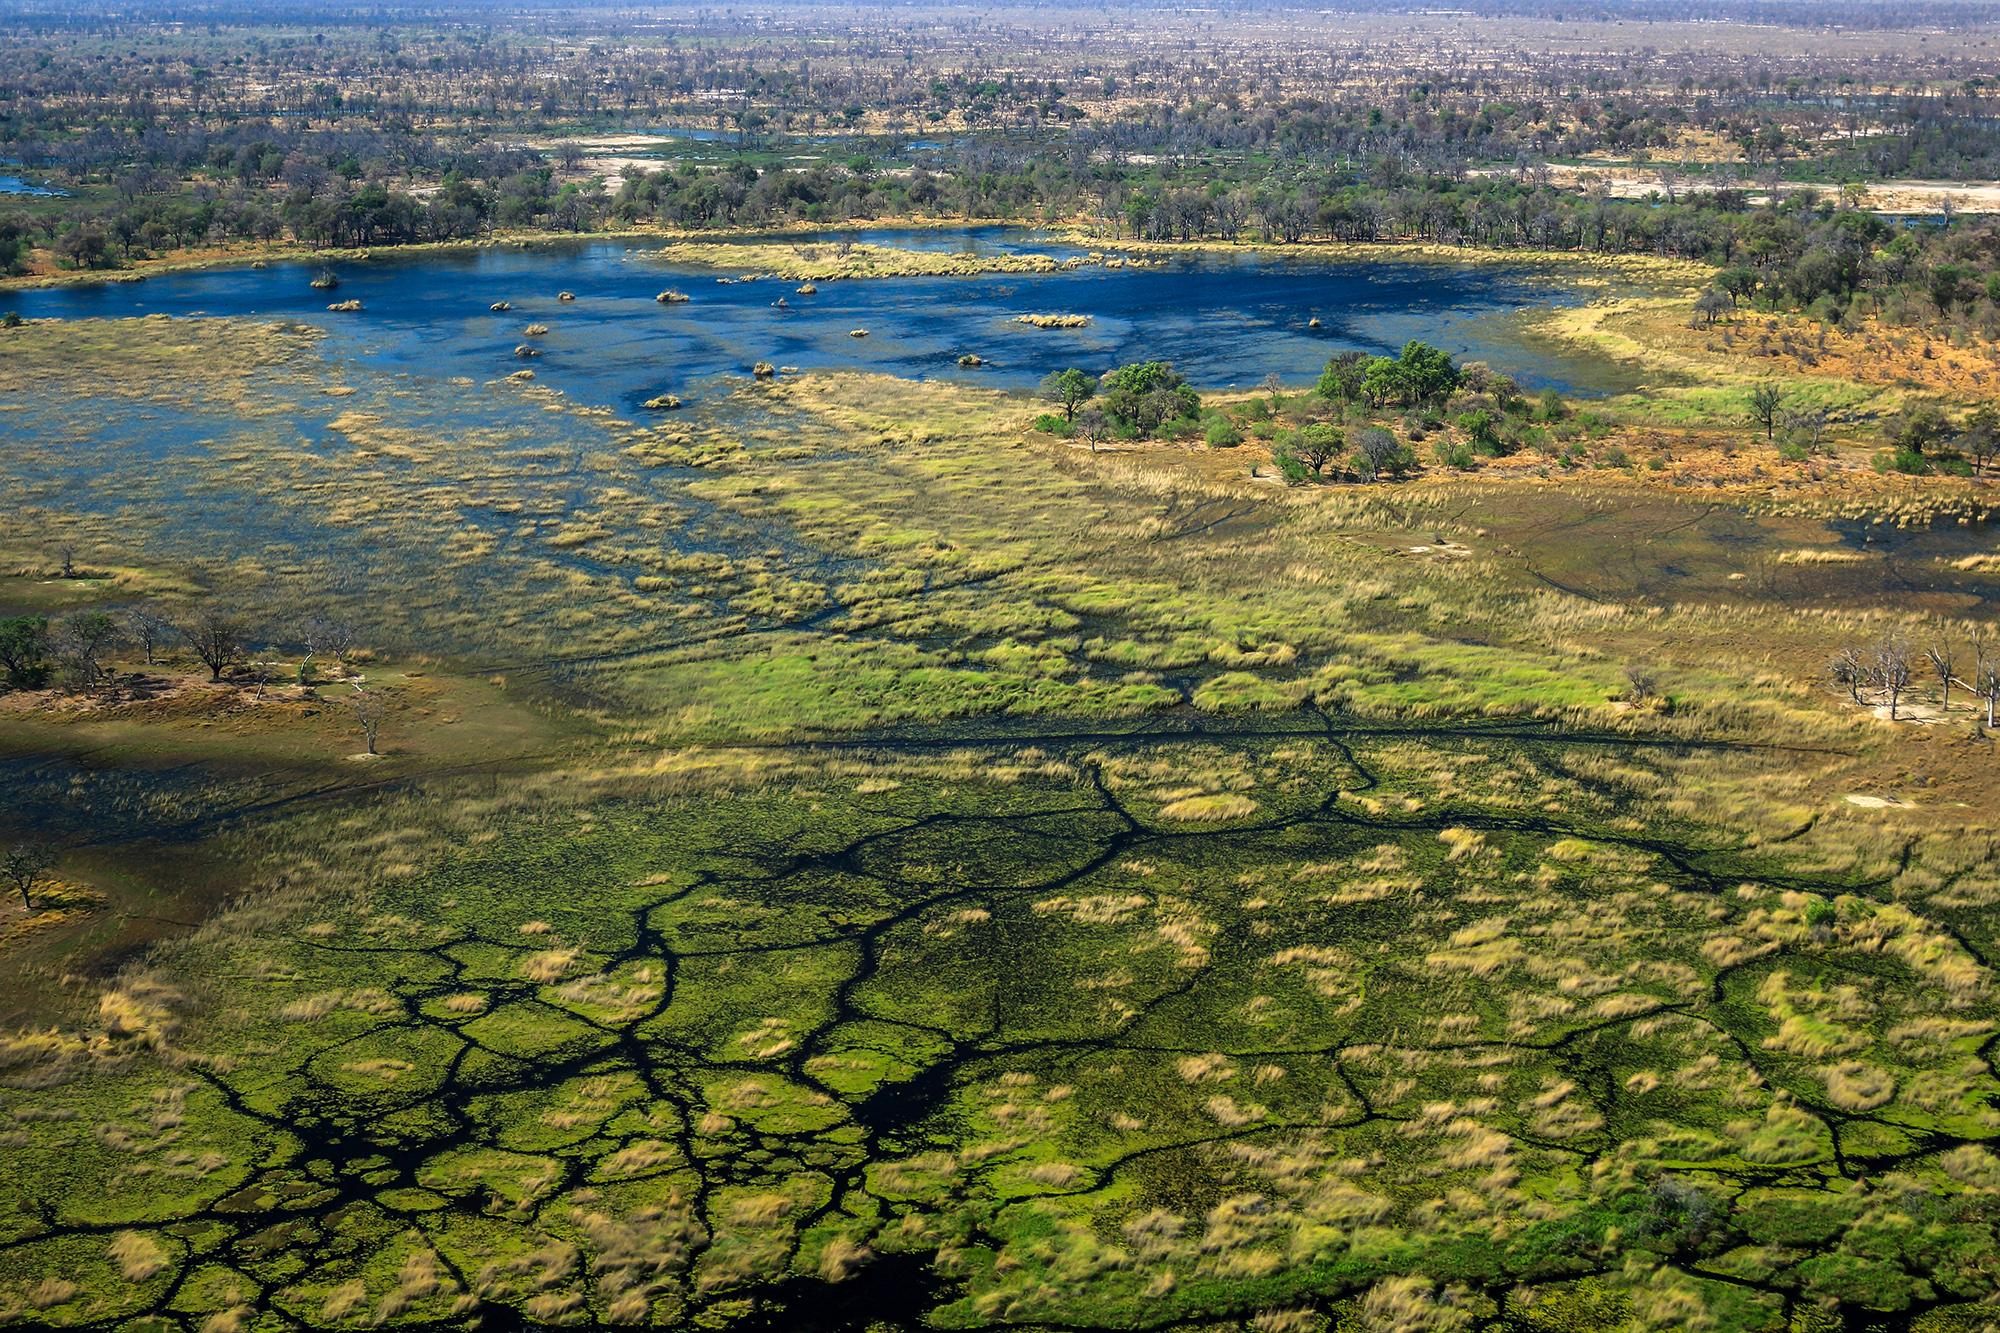 Okavango Delta au Botswana par Guillaume Projetti